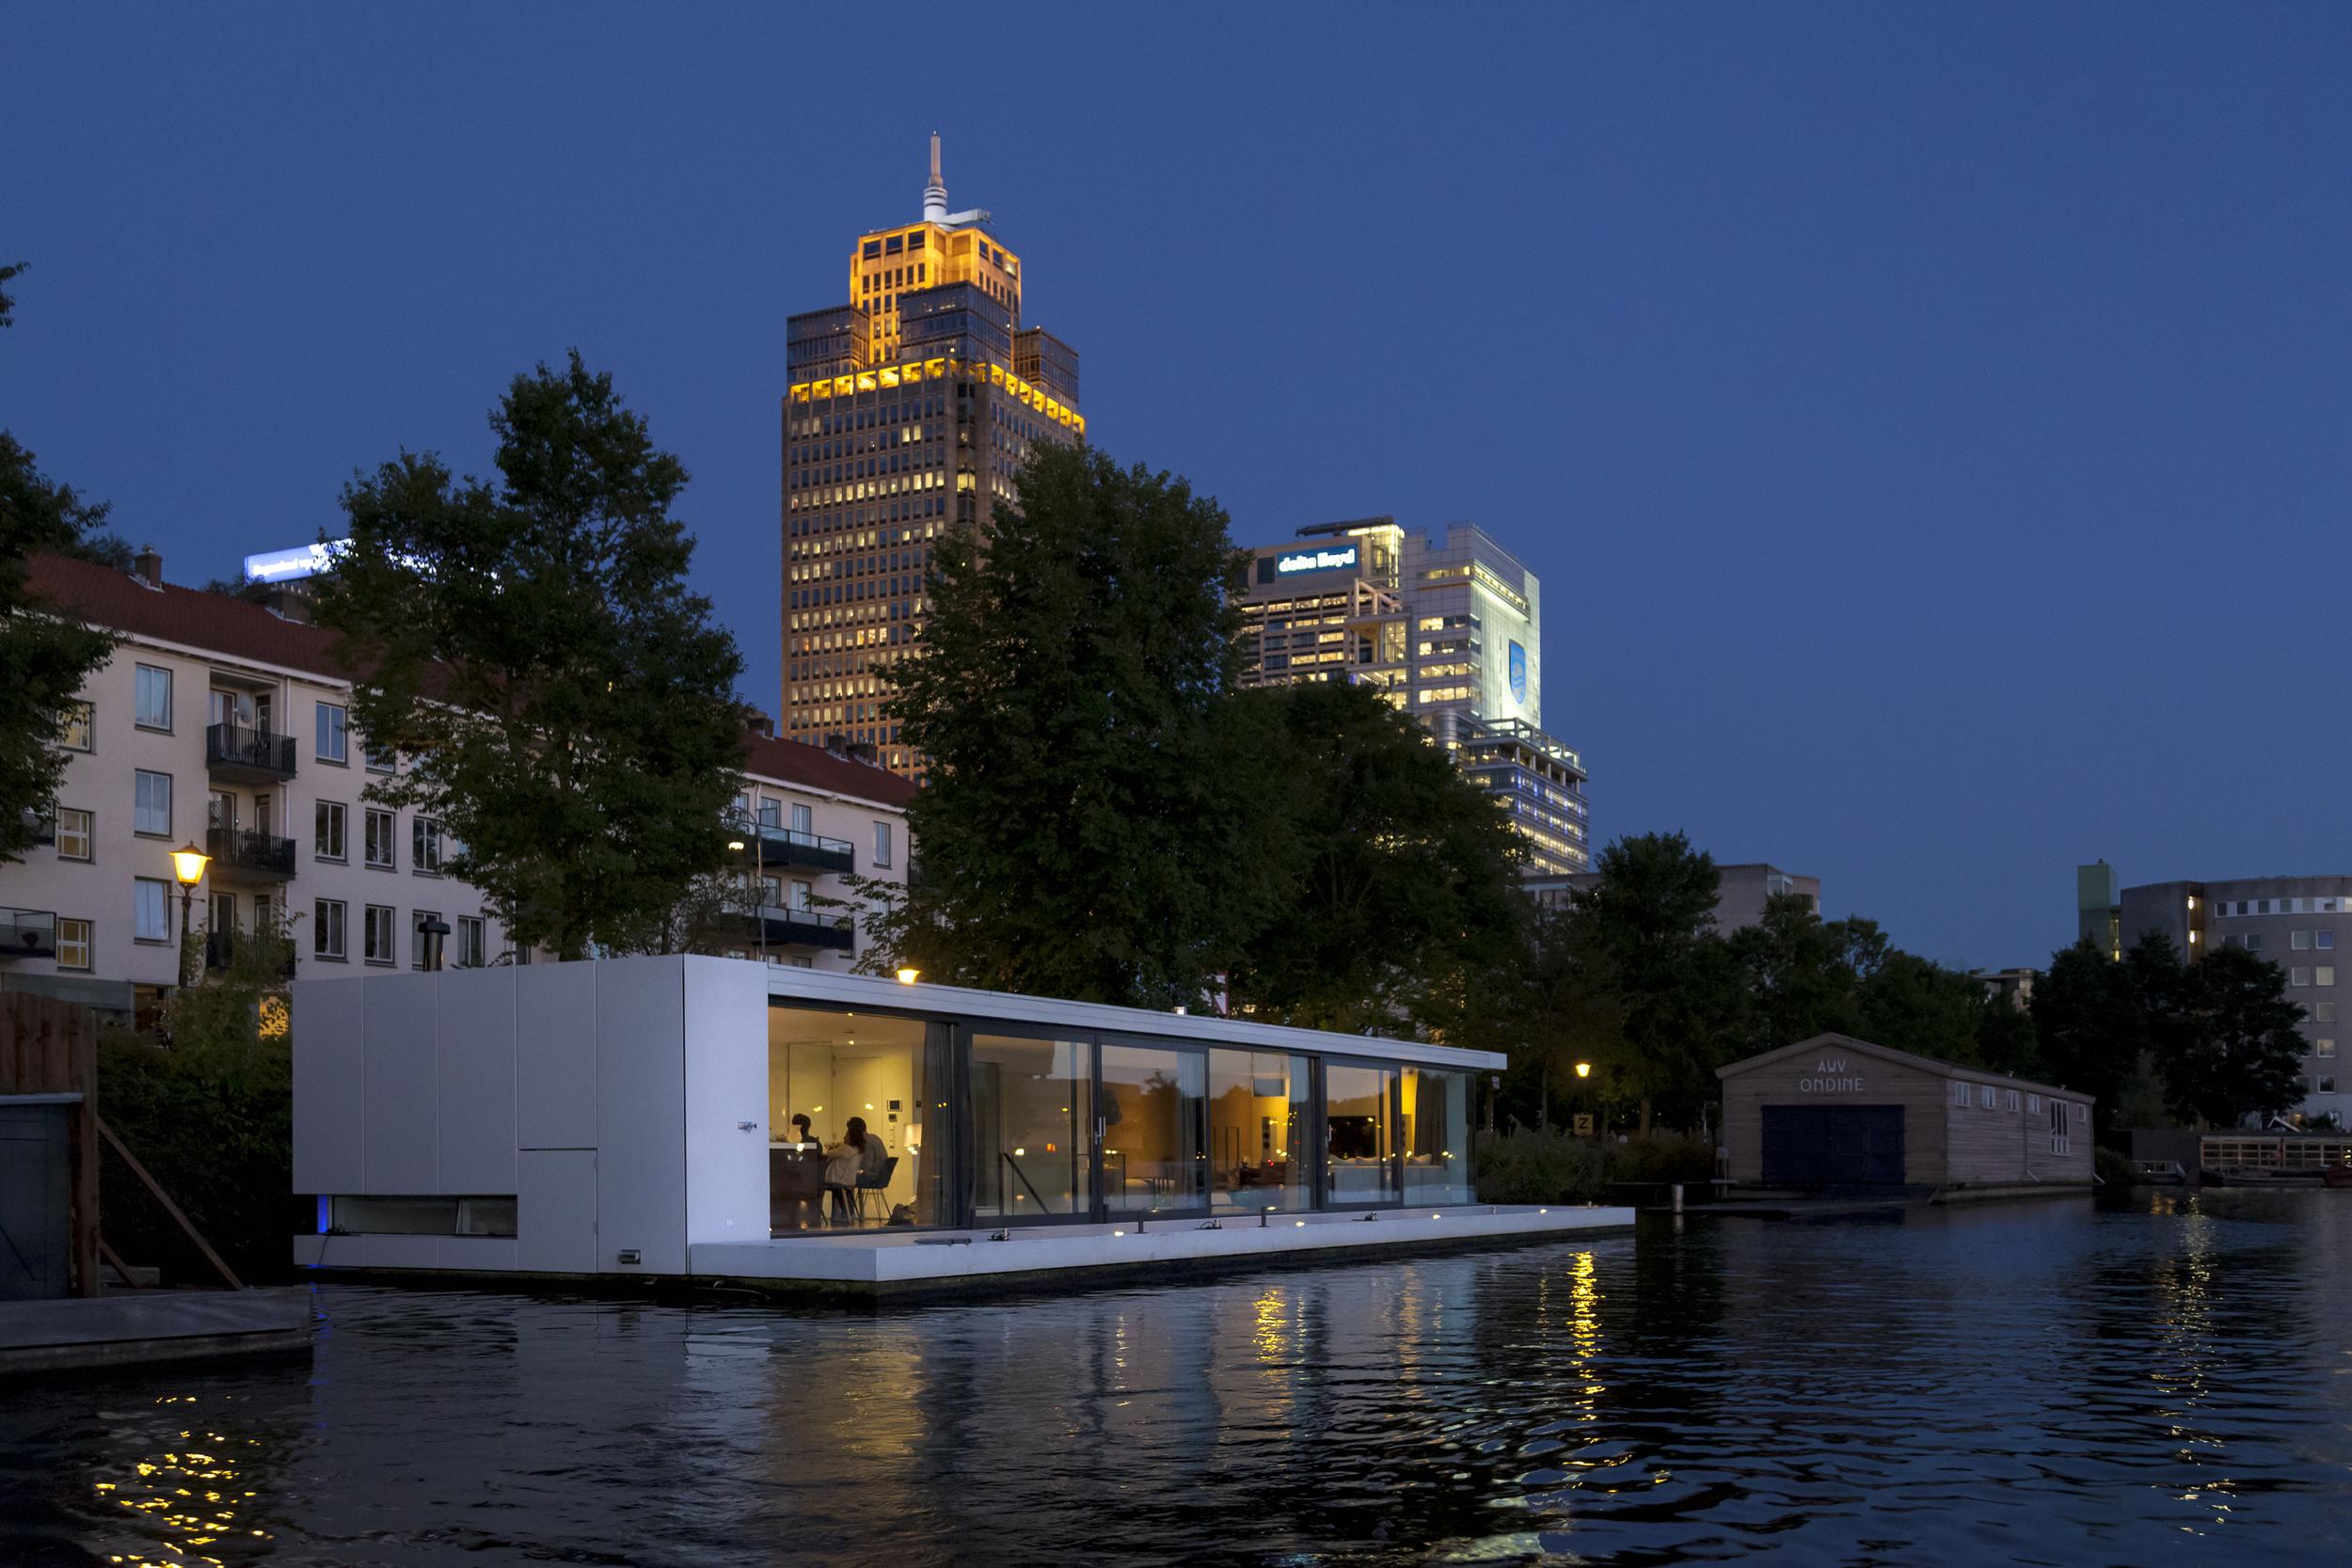 Watervilla Weesperzijde by +31 Architects, photo by Ewout Huibers